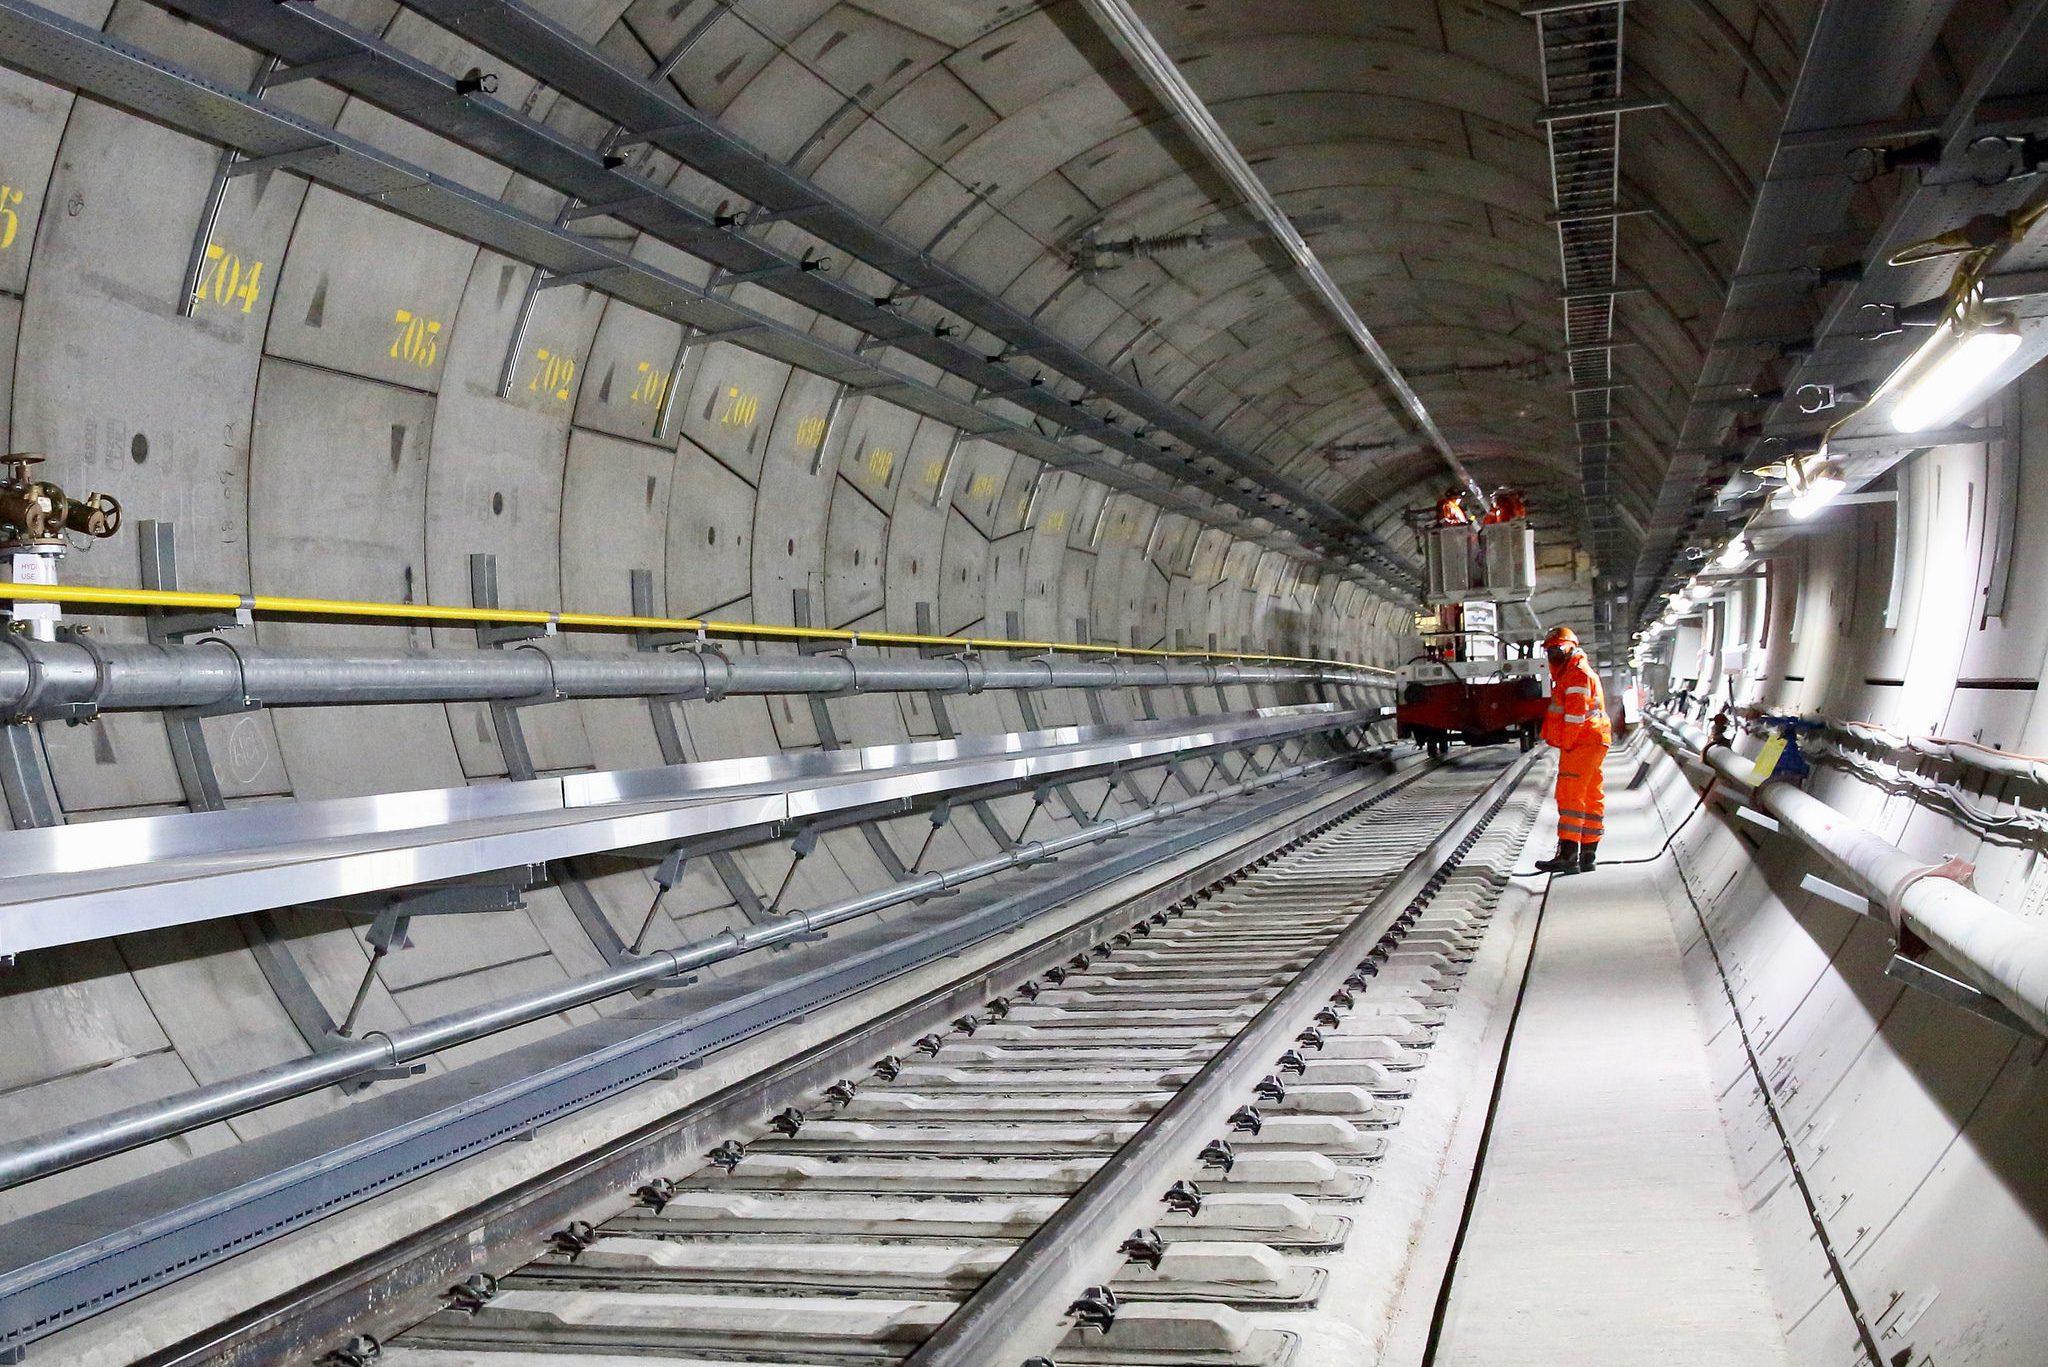 Crossrail image - copyright Transport for London